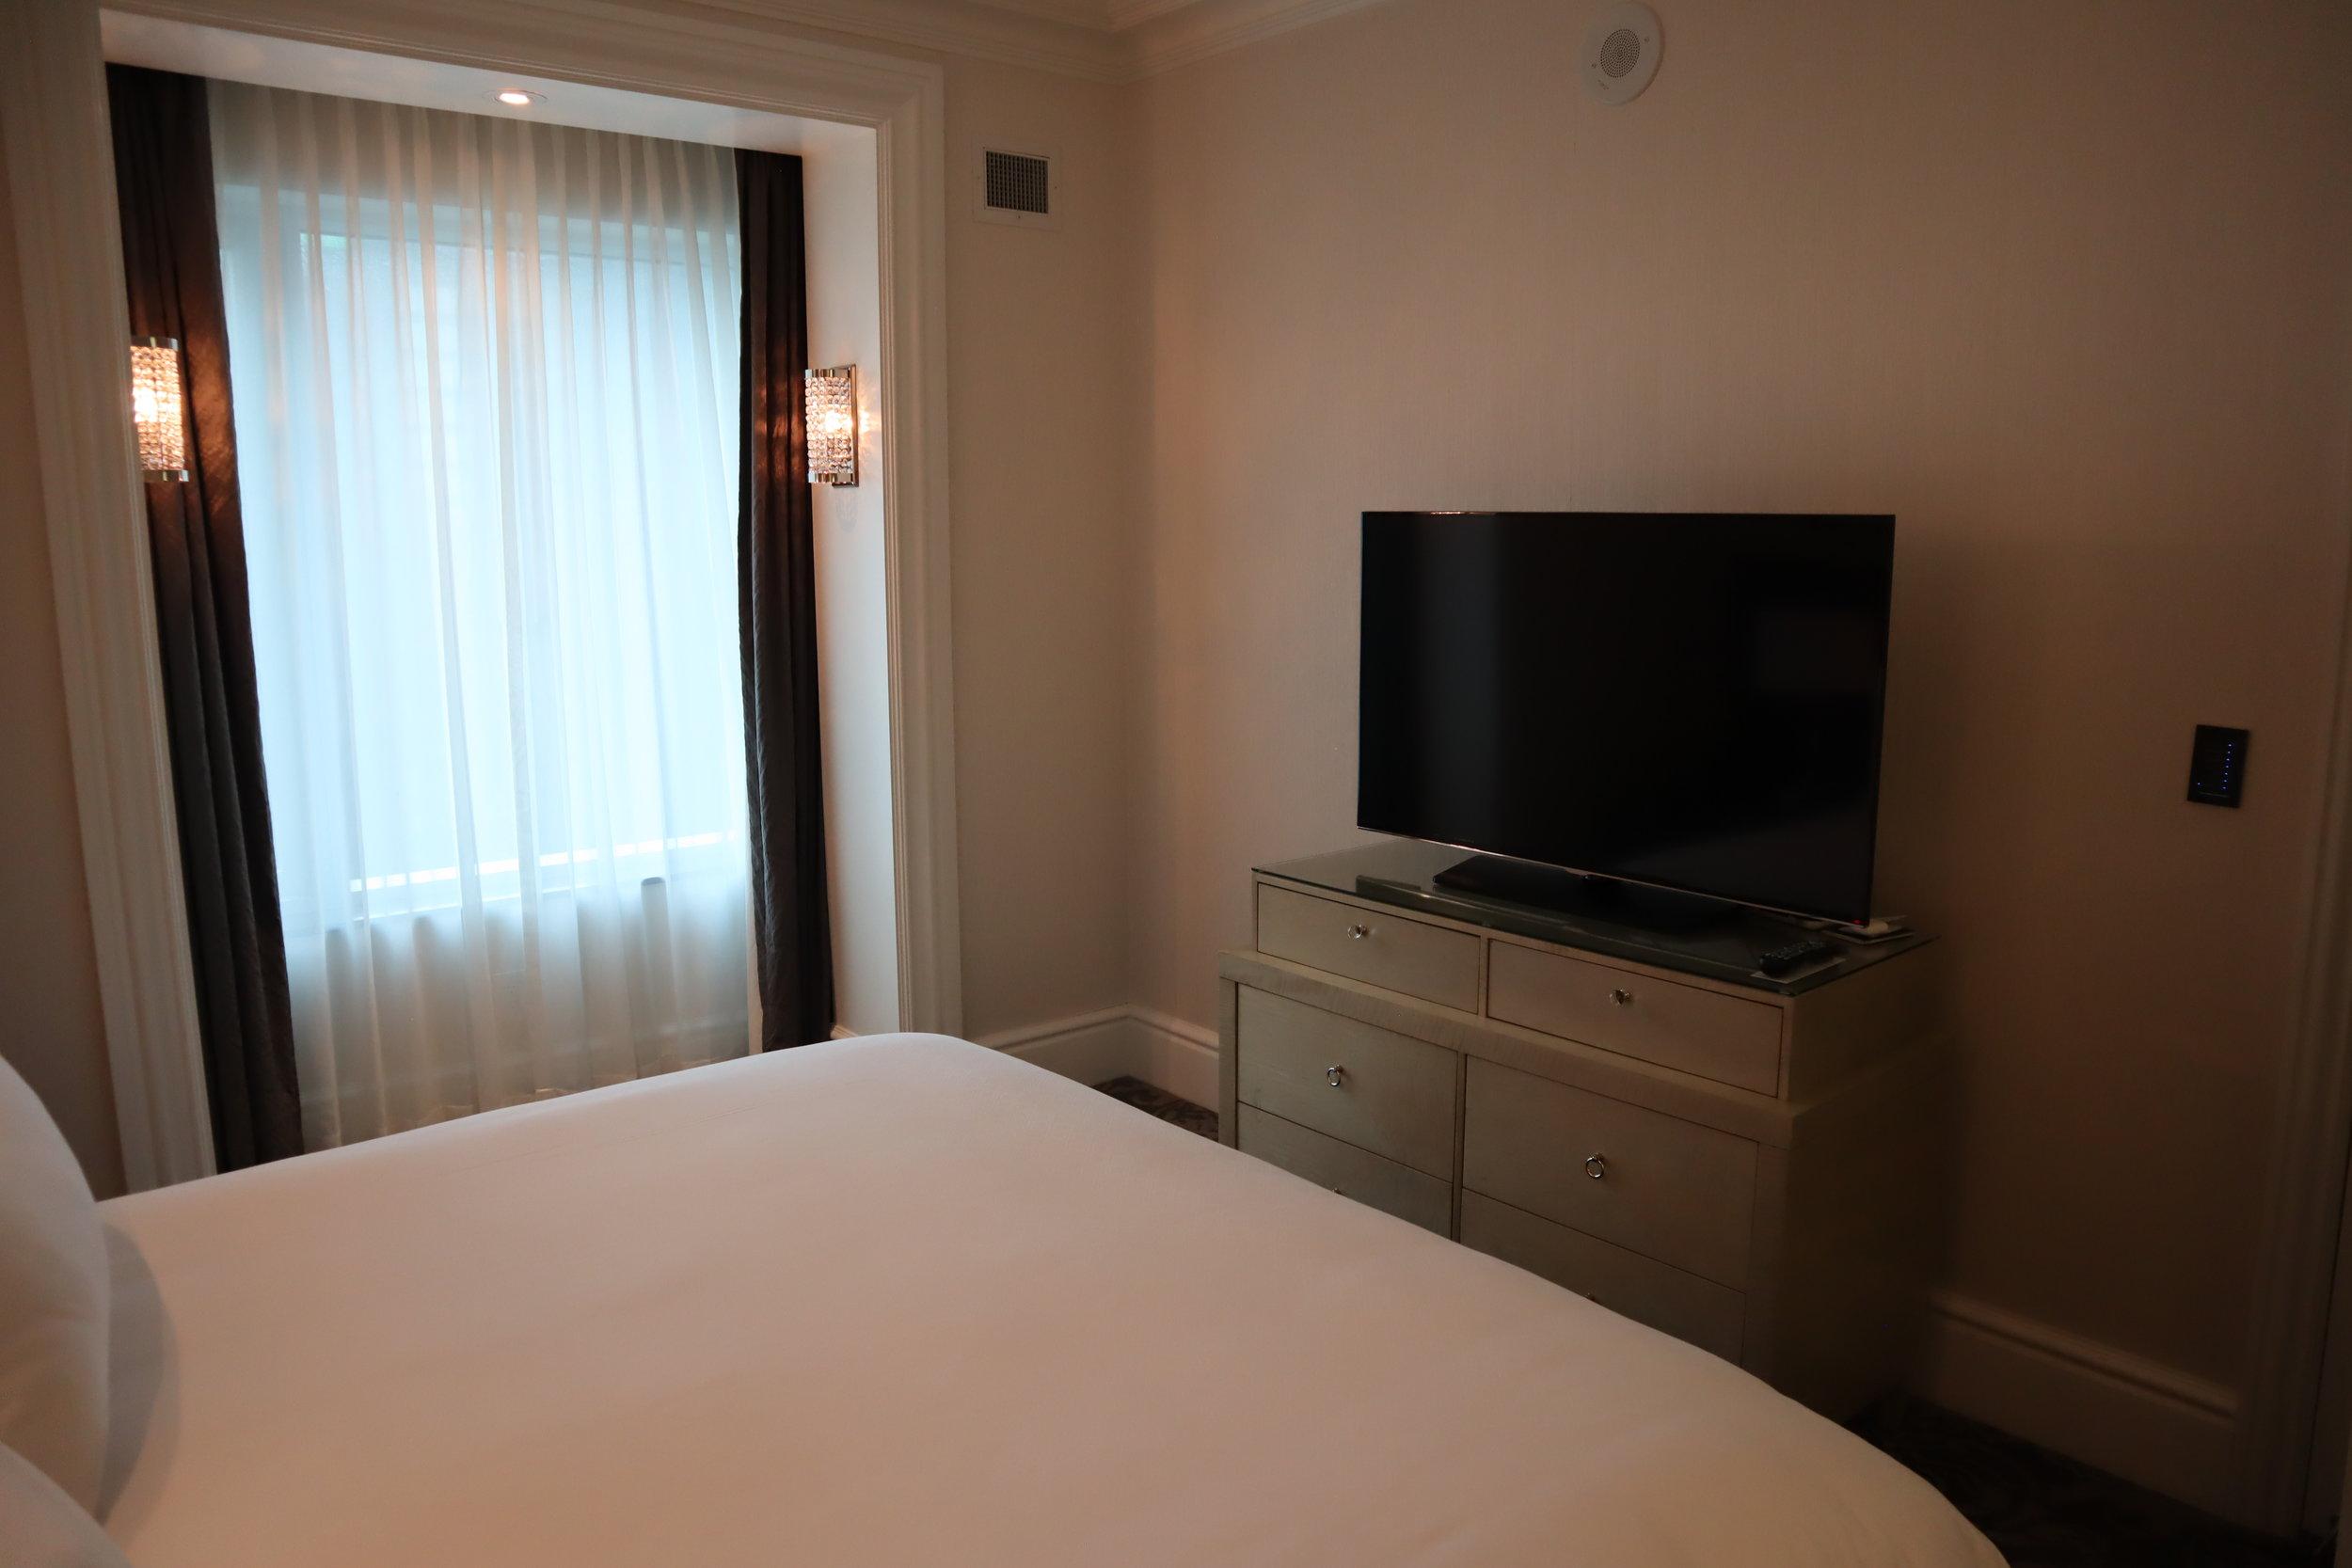 St. Regis Toronto – Two-bedroom suite guest bedroom television